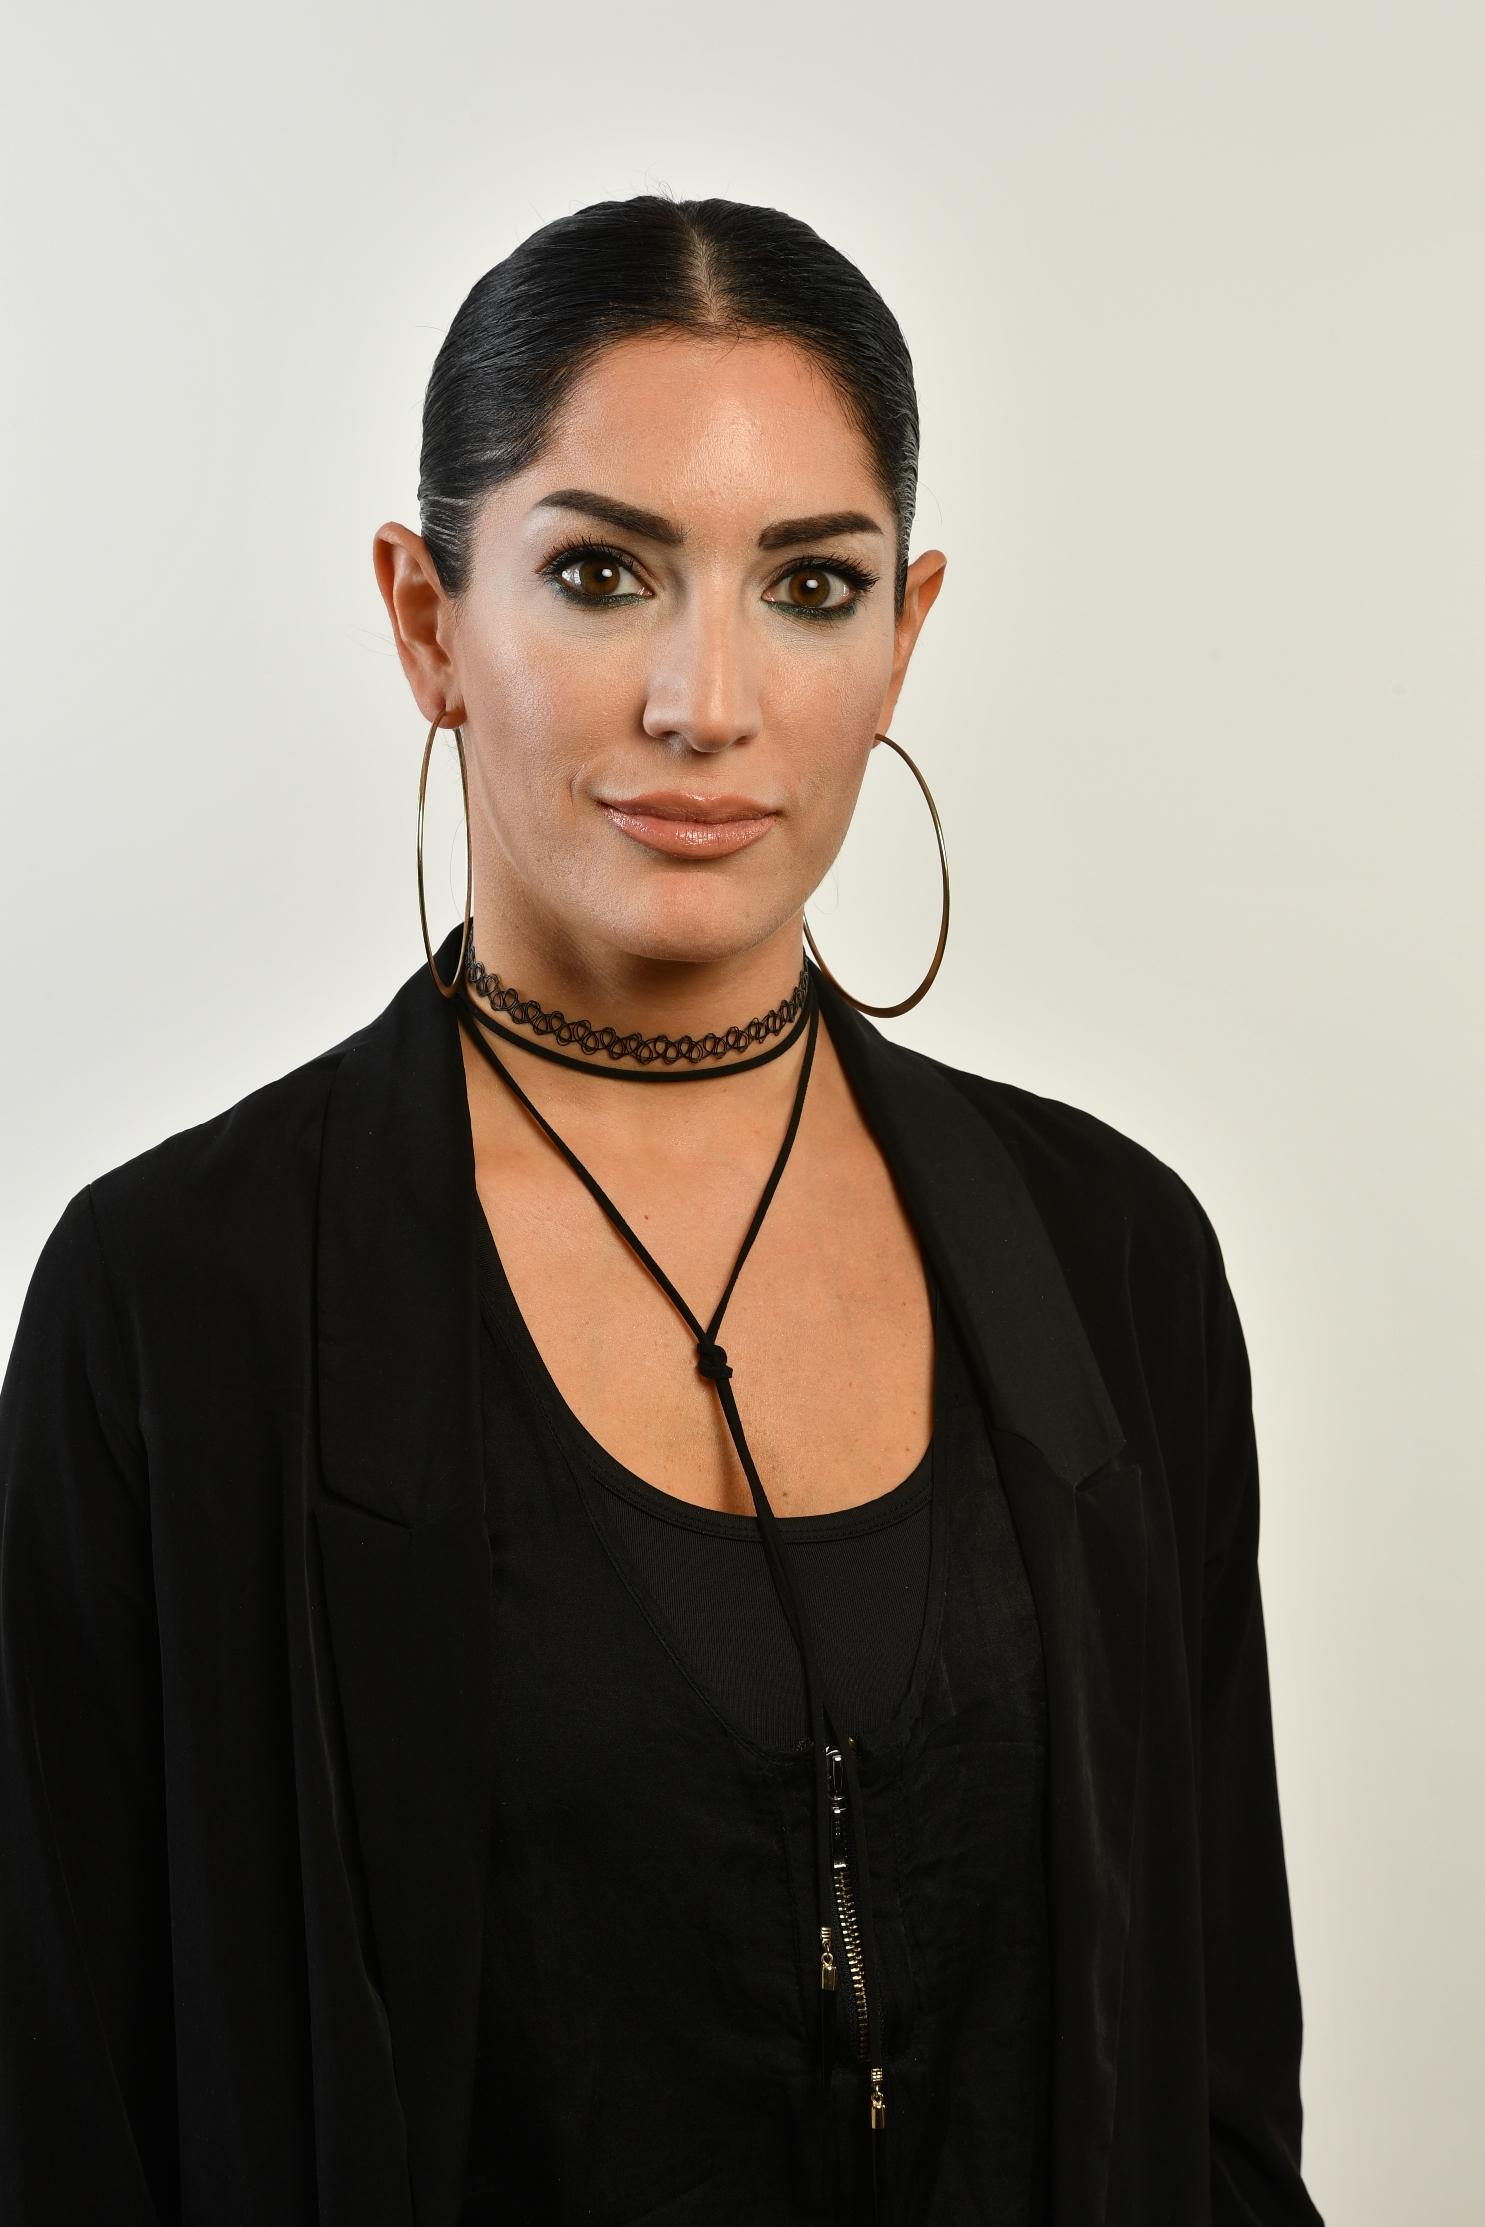 Silan Avsar Tekkök Profile Picture